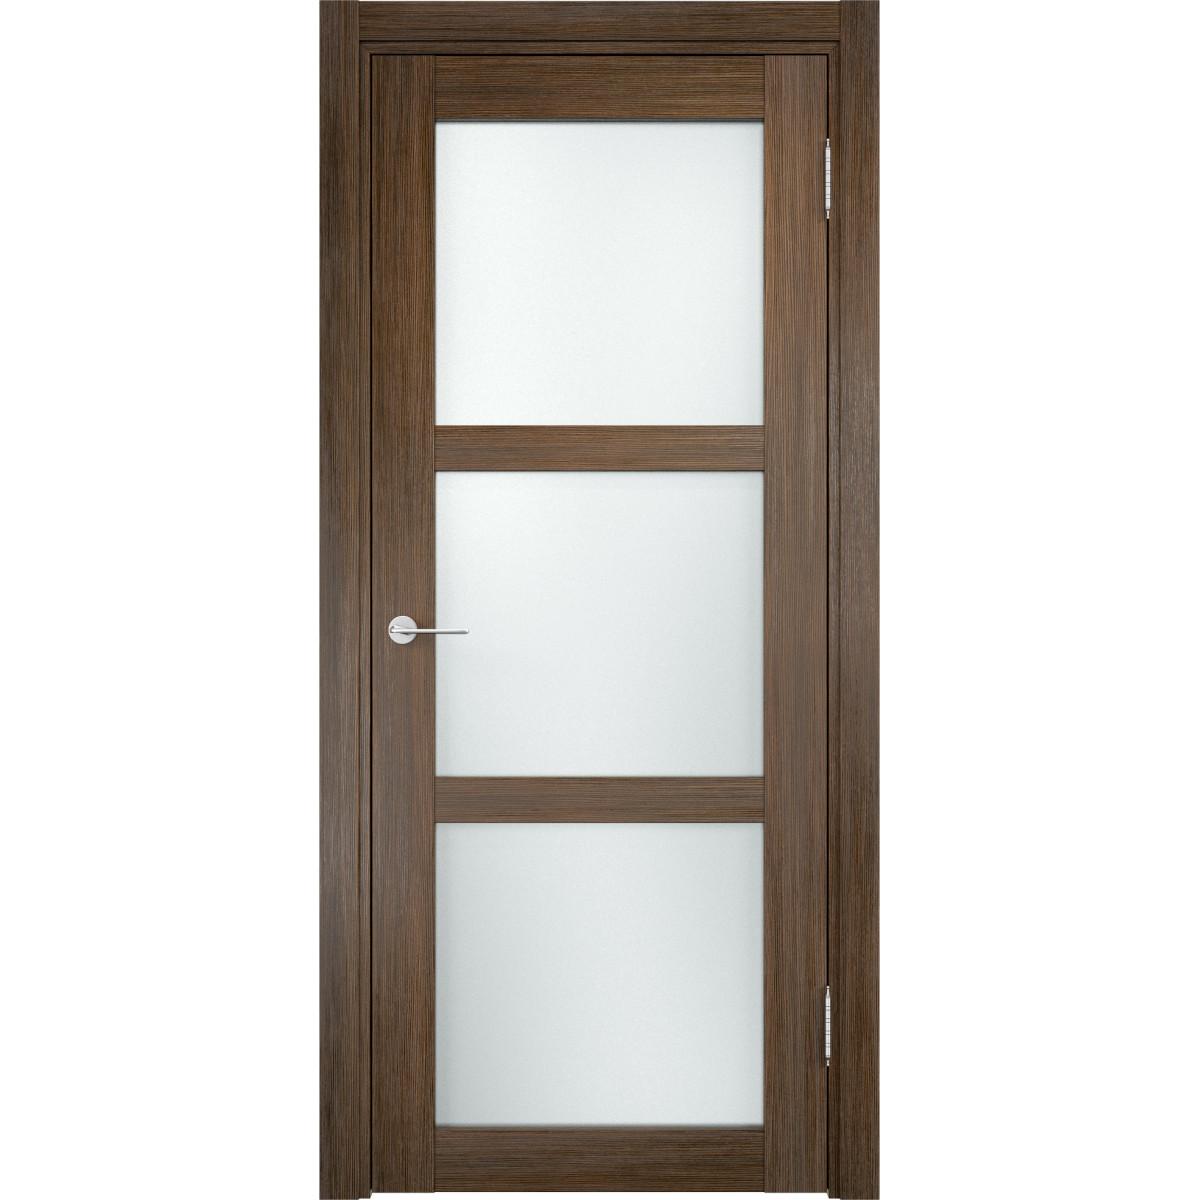 Дверное полотно Casaporte Рома МП_0112 2000х800х44 мм МДФ